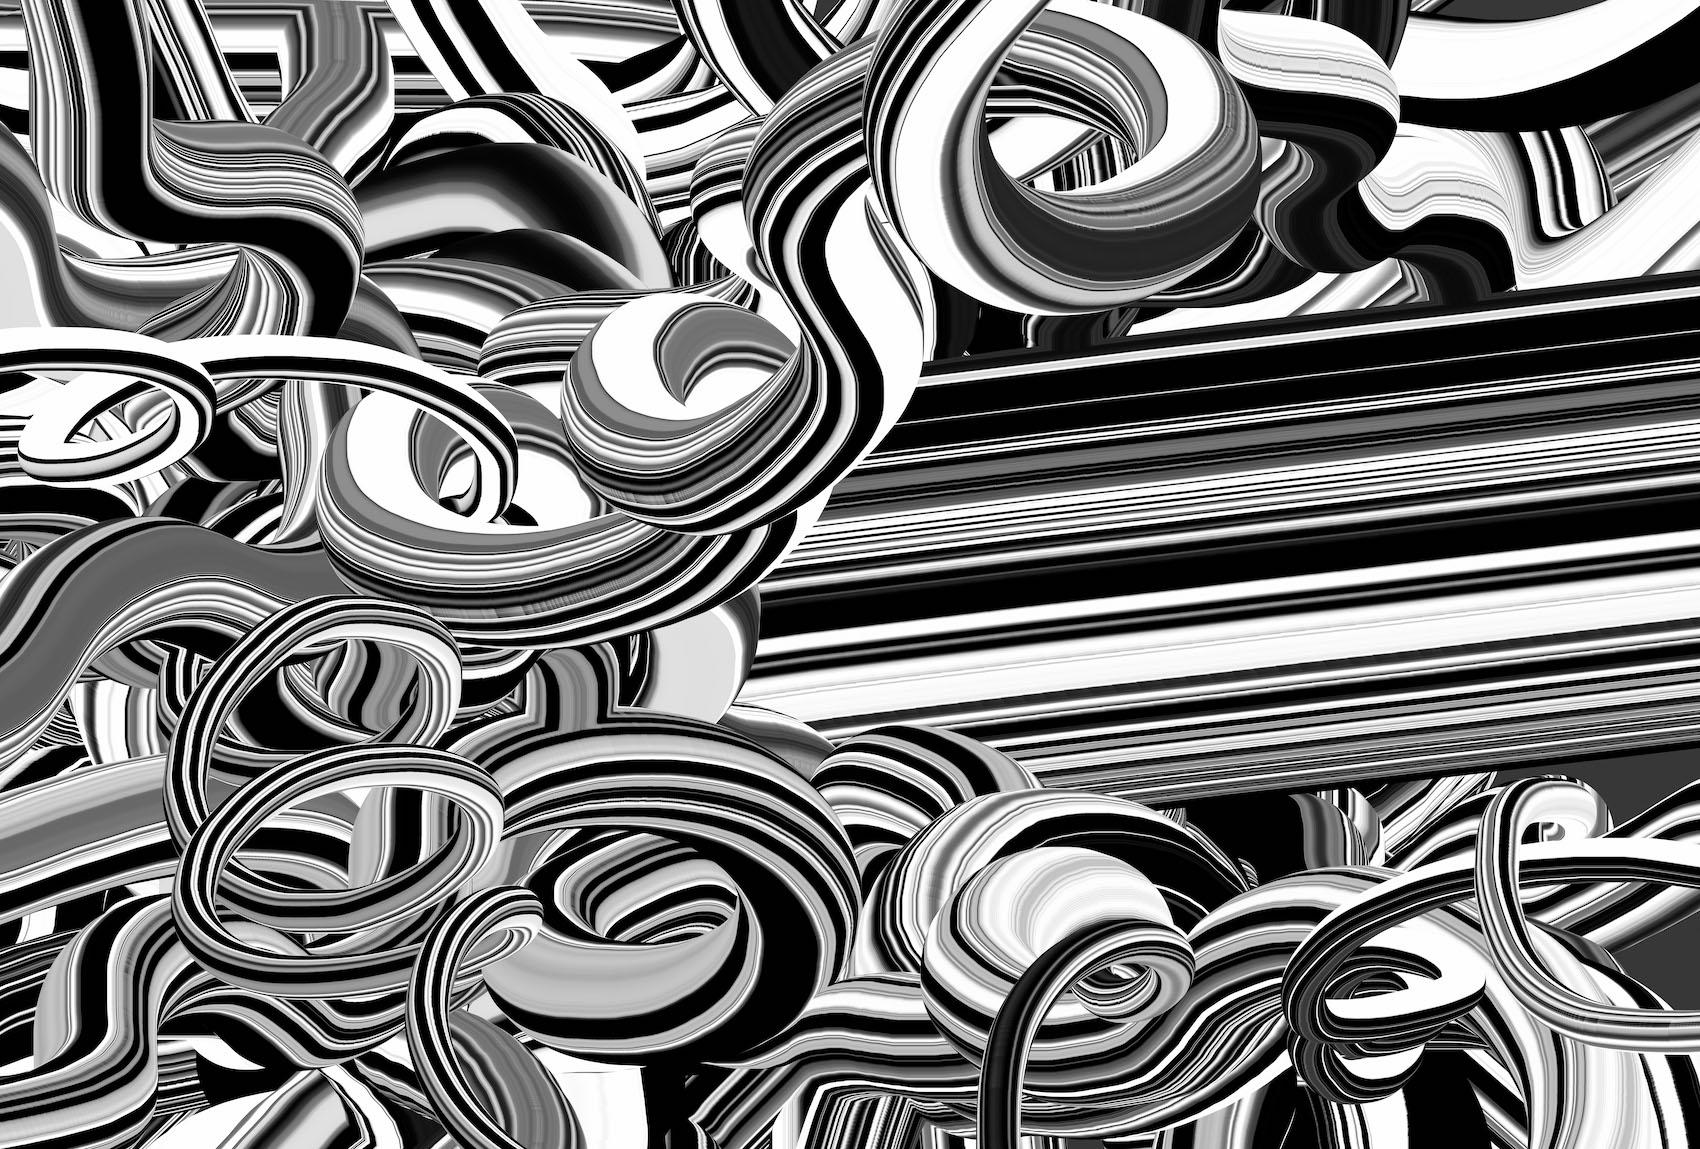 RogelioMaxwell-Springing #5-2017-ArchivalPigmentPrint-24x36.jpg